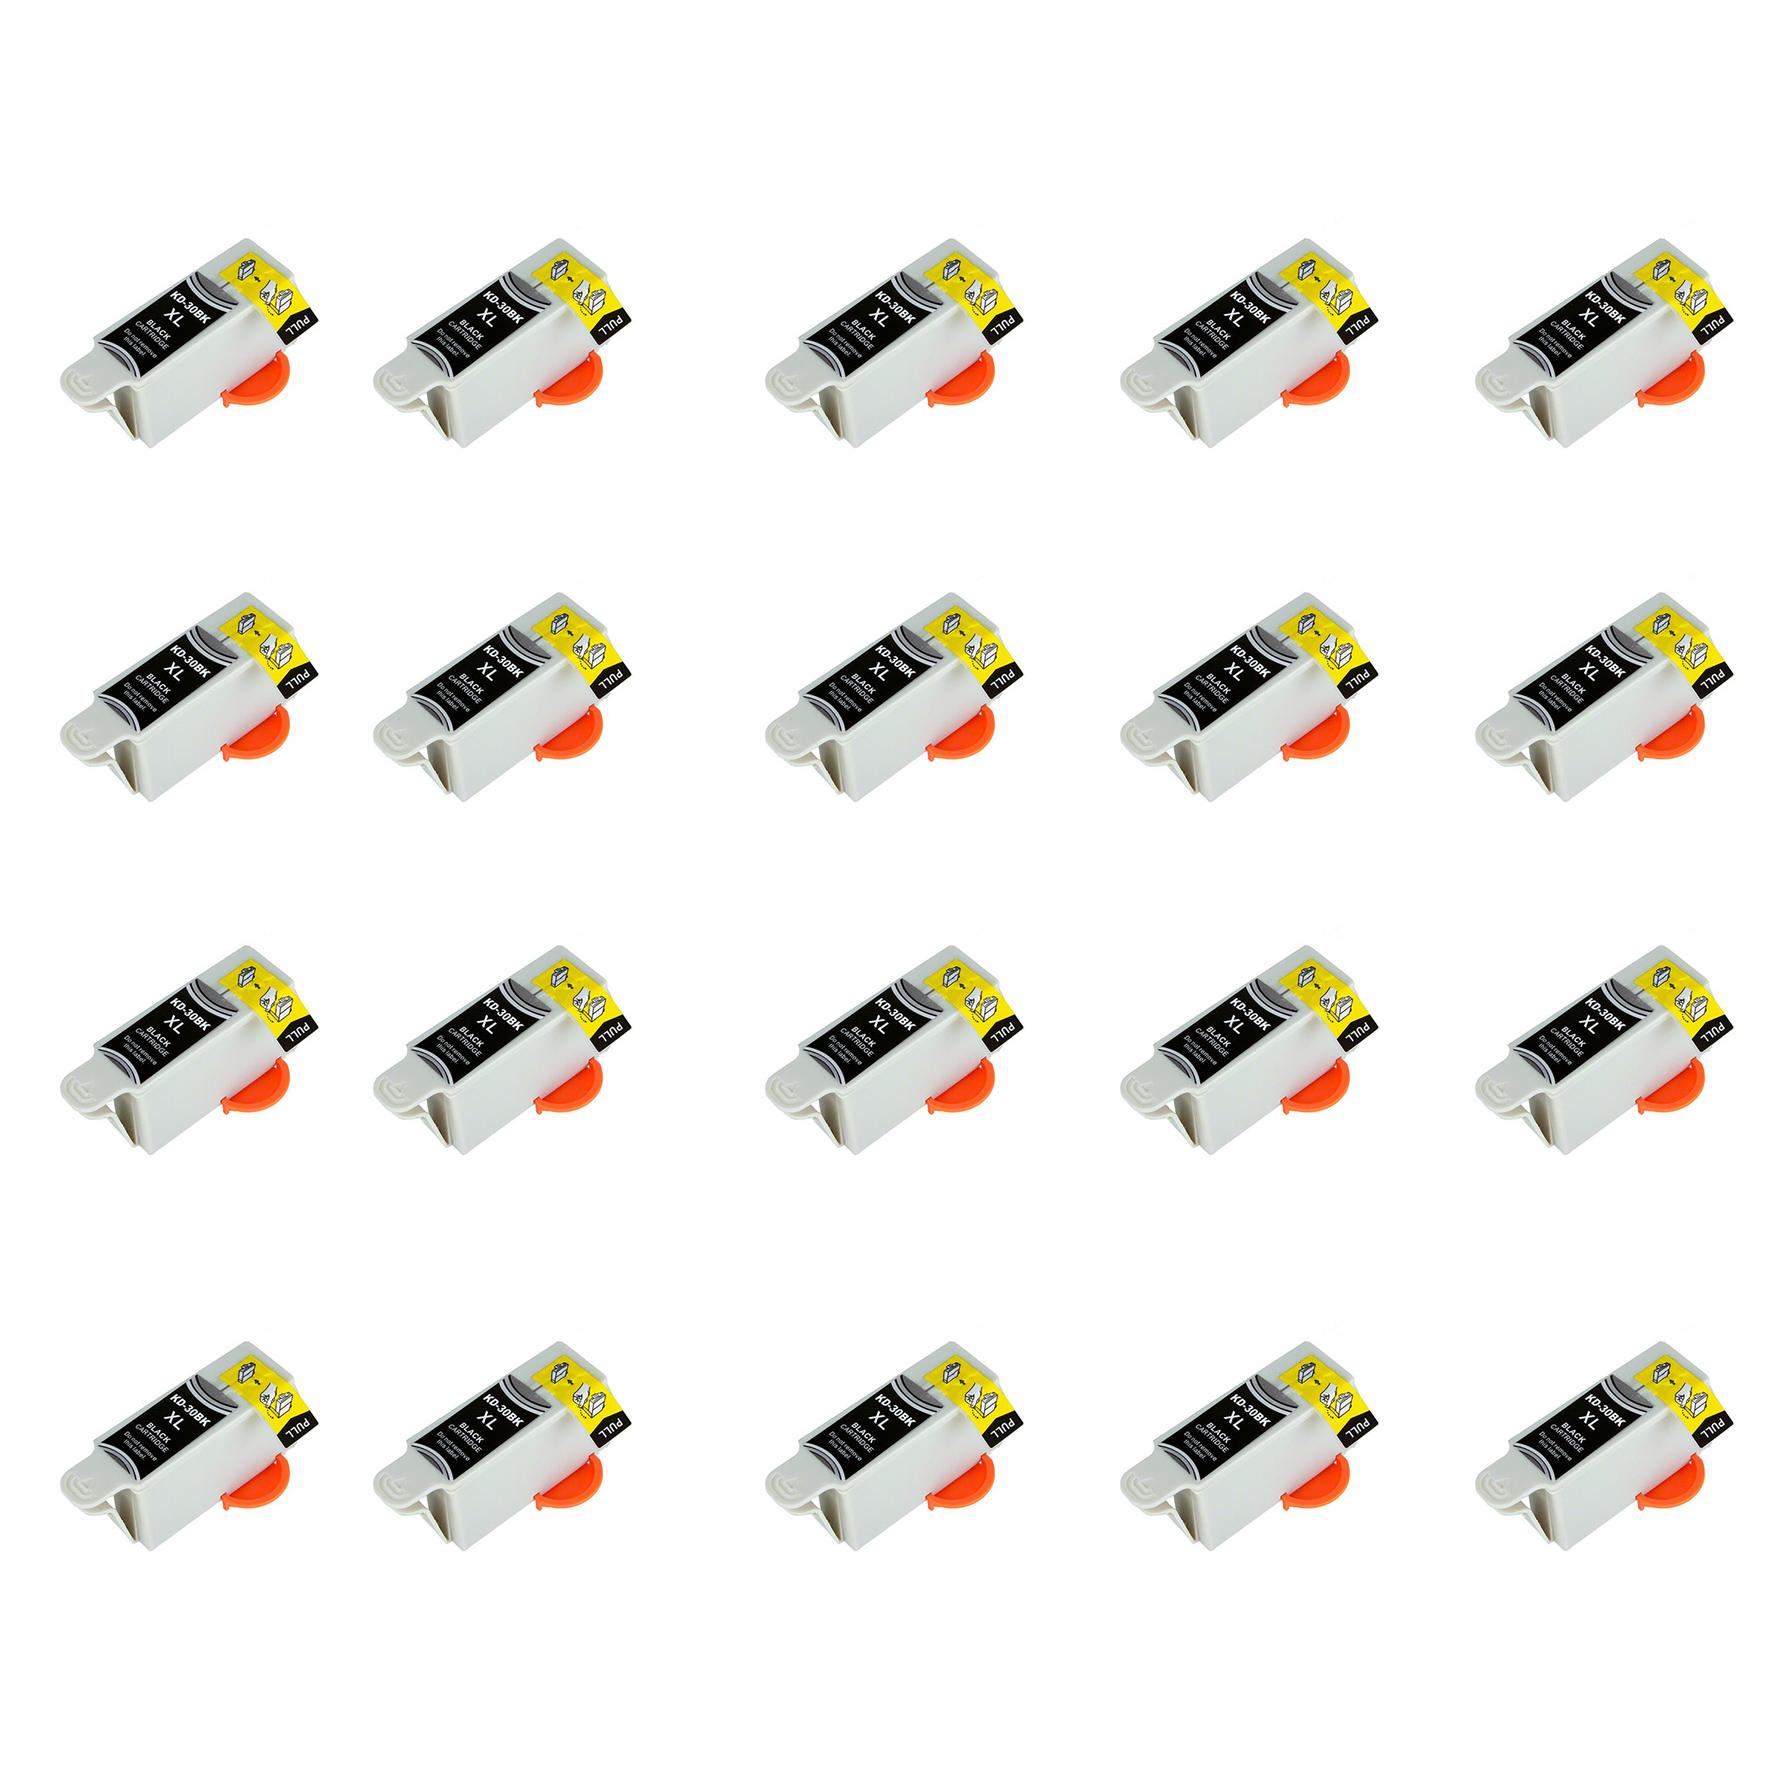 7dayshop Compatible Kodak Series 30 Black Ink Cartridge (30B  30XL)  20 Pack